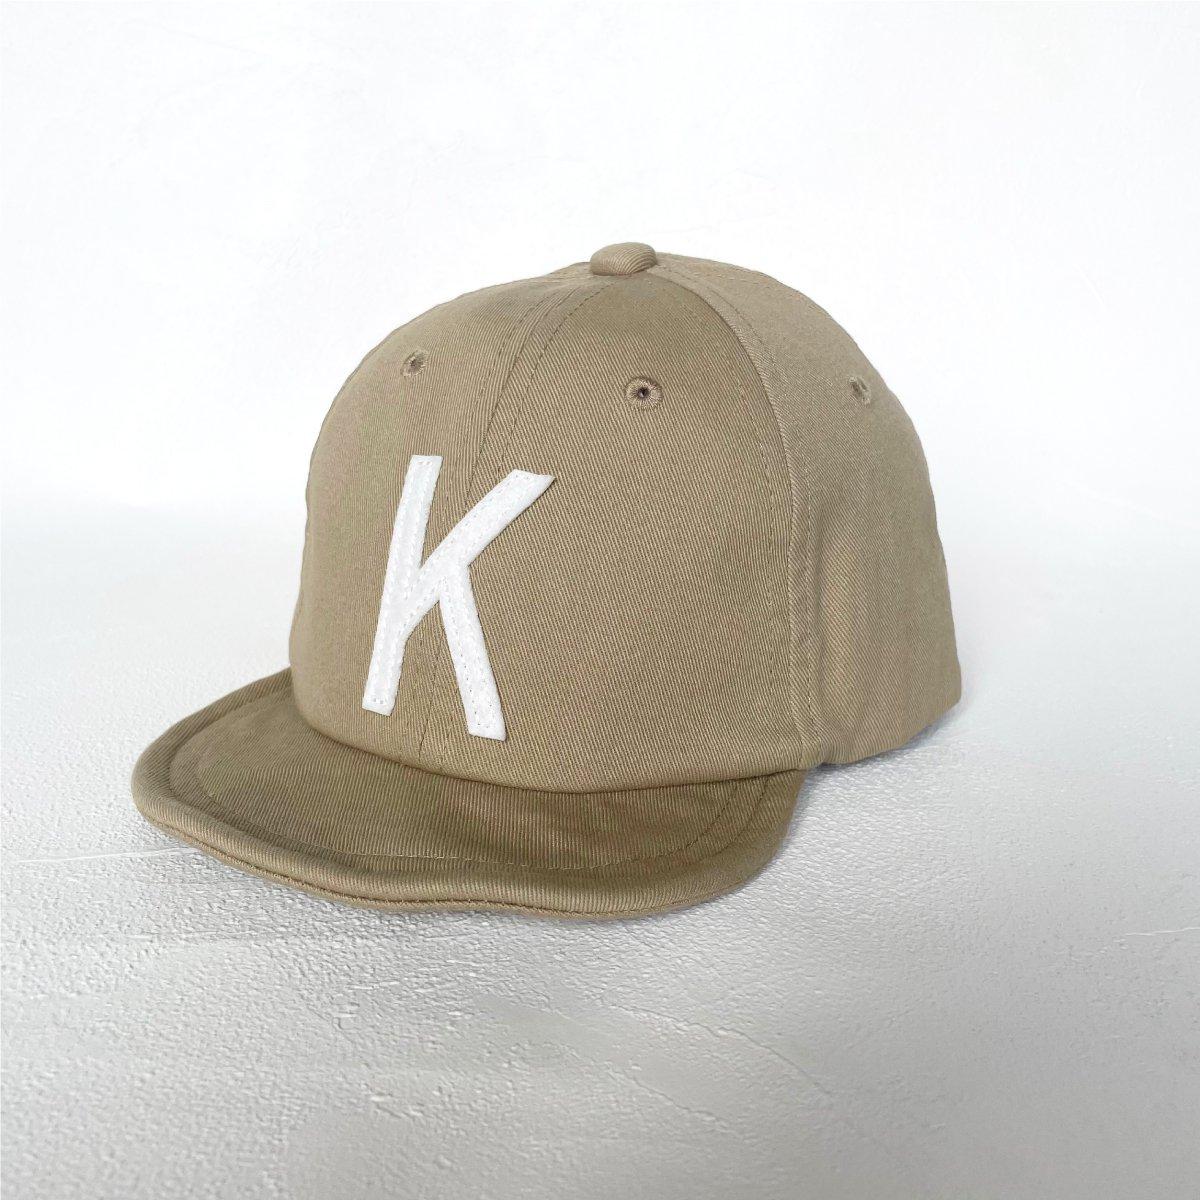 【KIDS】Kids Sim Logo Cap 詳細画像2